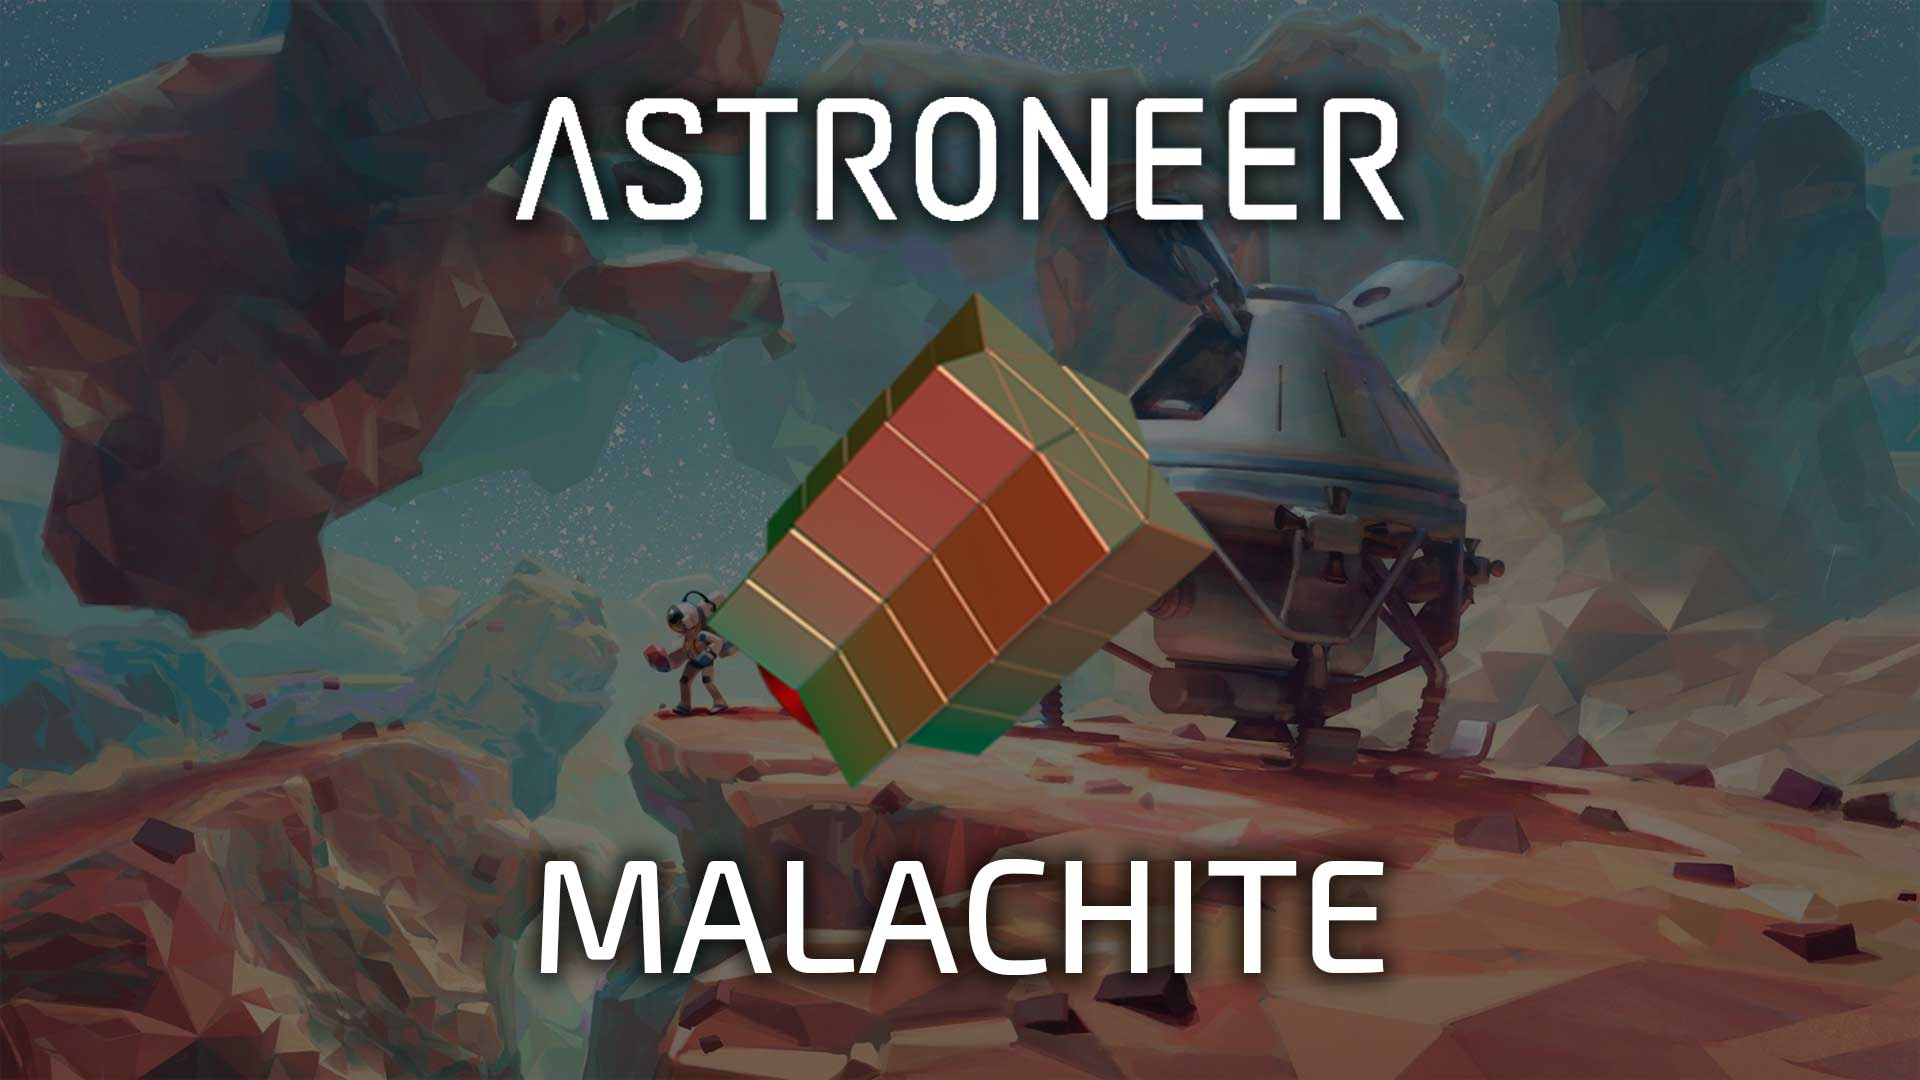 Astroneer Malachite